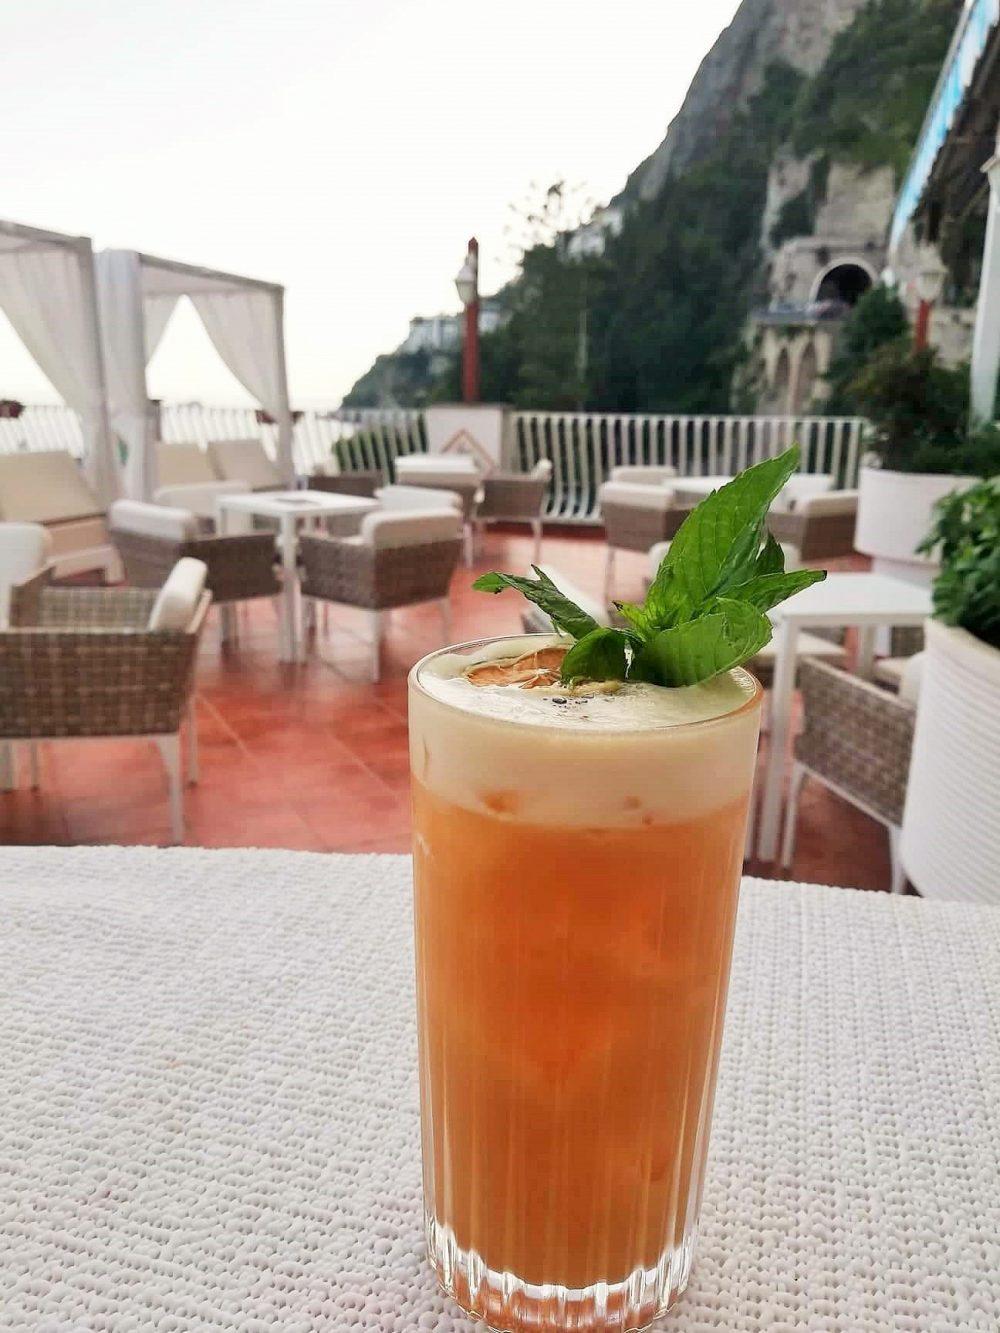 Sea Waves Bar - Drink con Rum, succo d'ananas, lime, Falernum e sherry